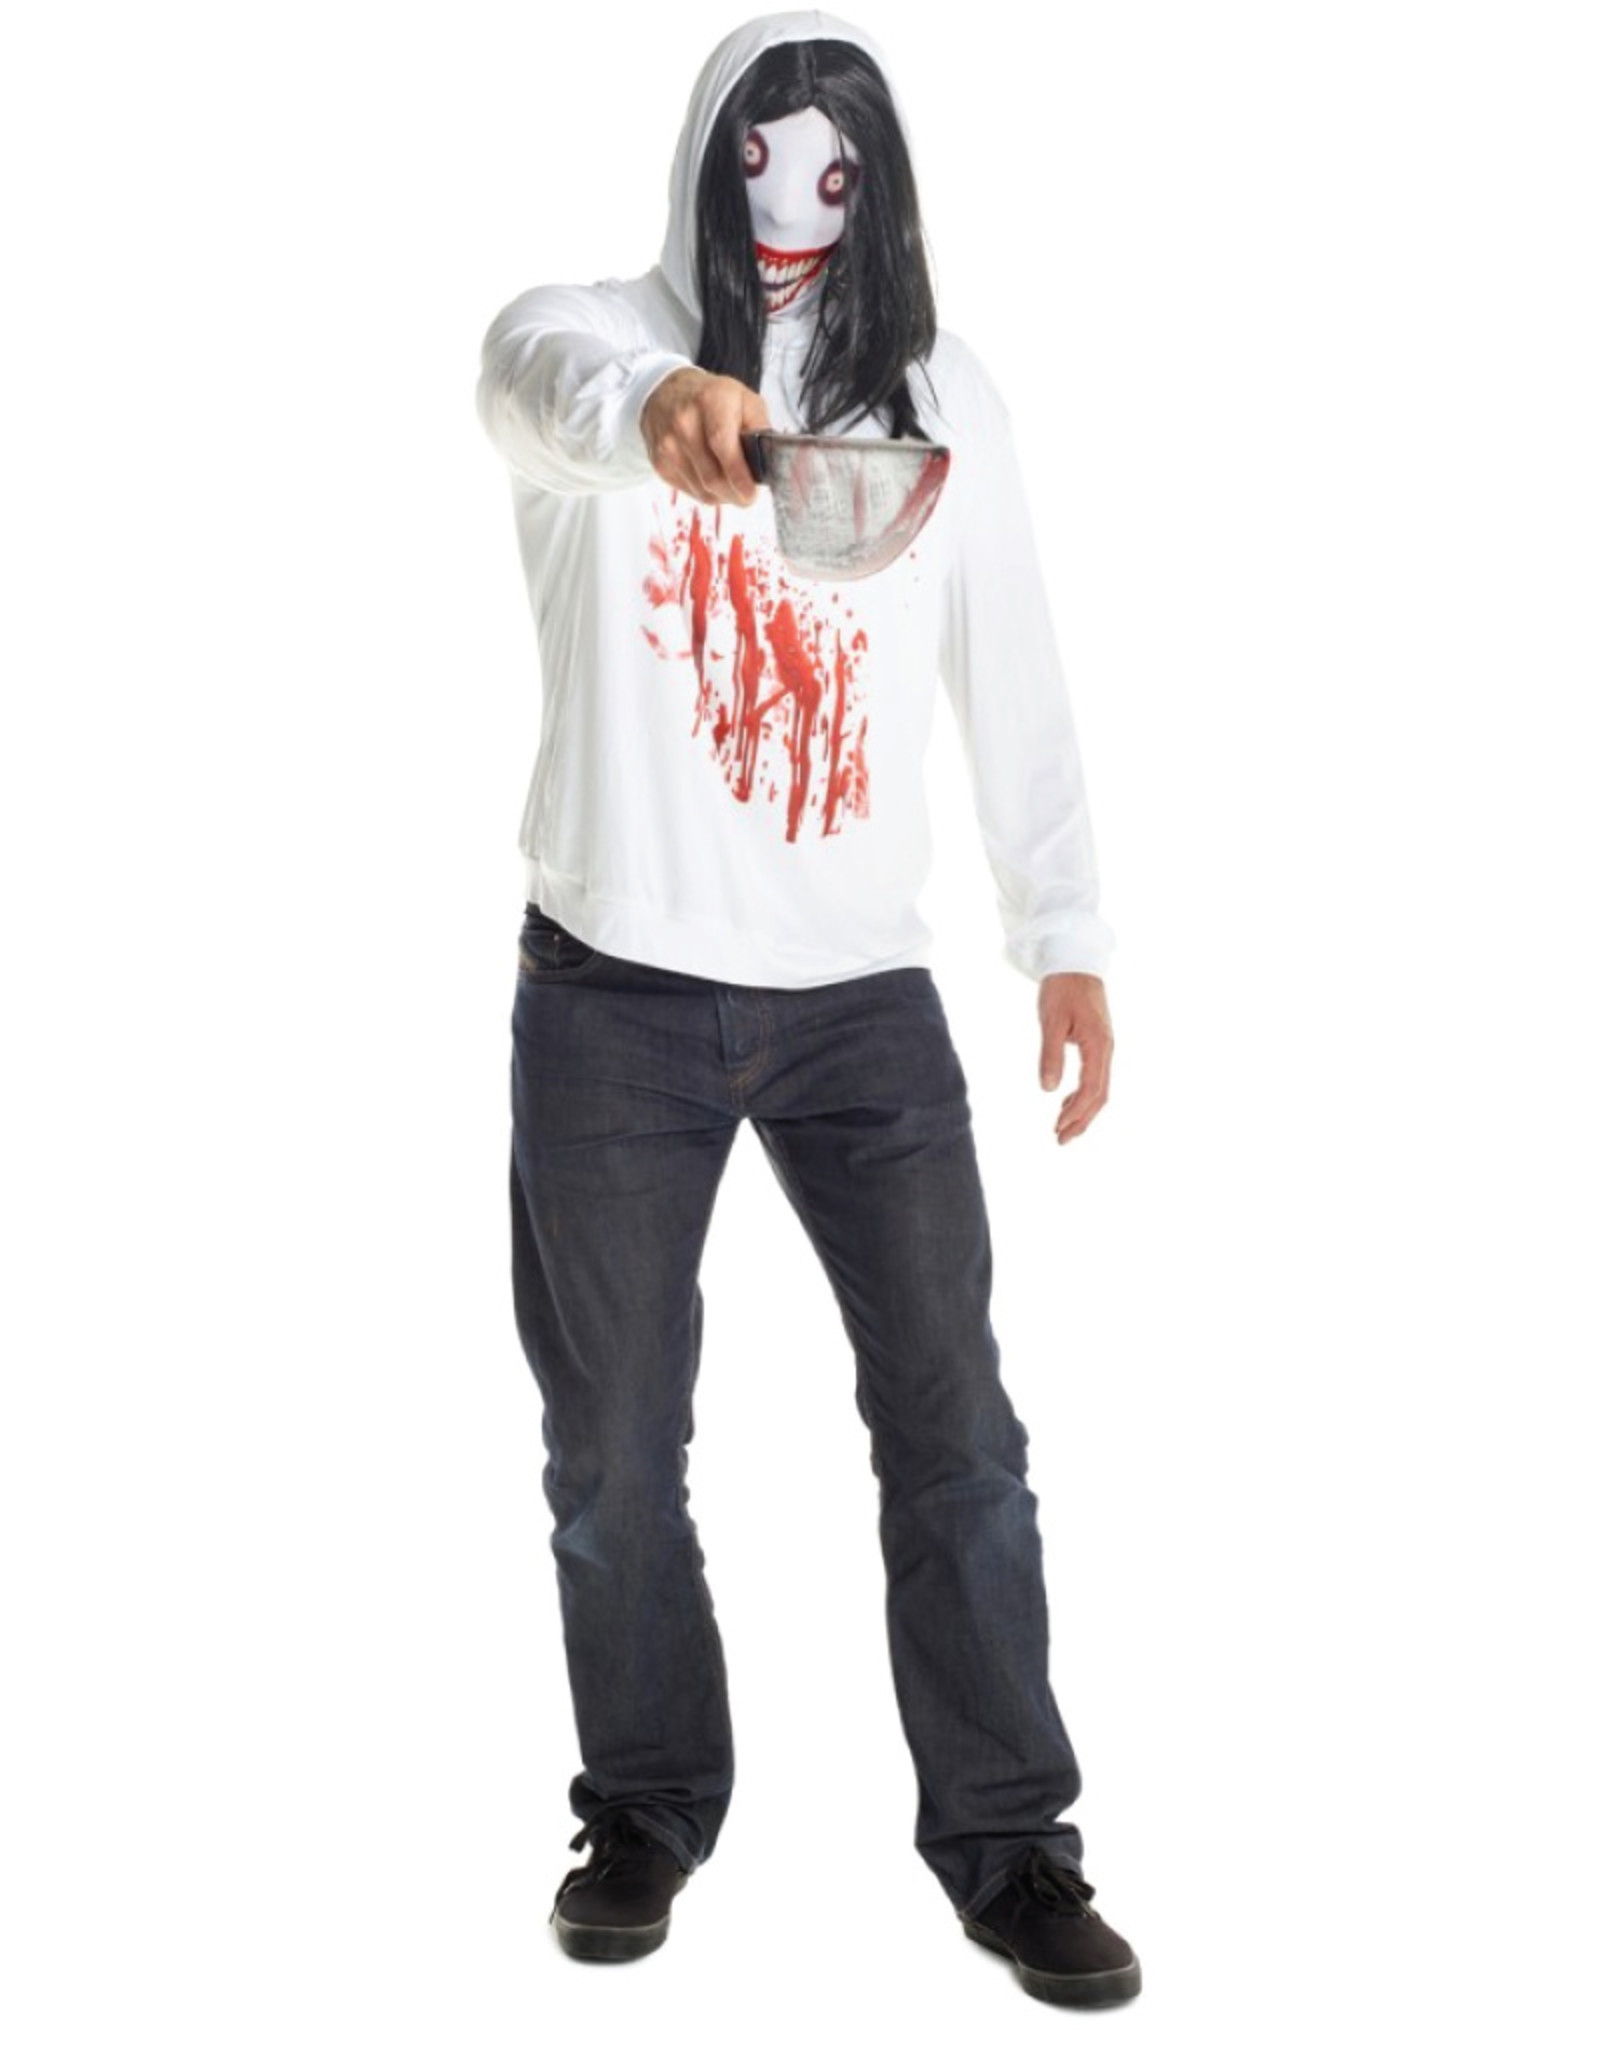 Jeff the Killer Costume - Men's